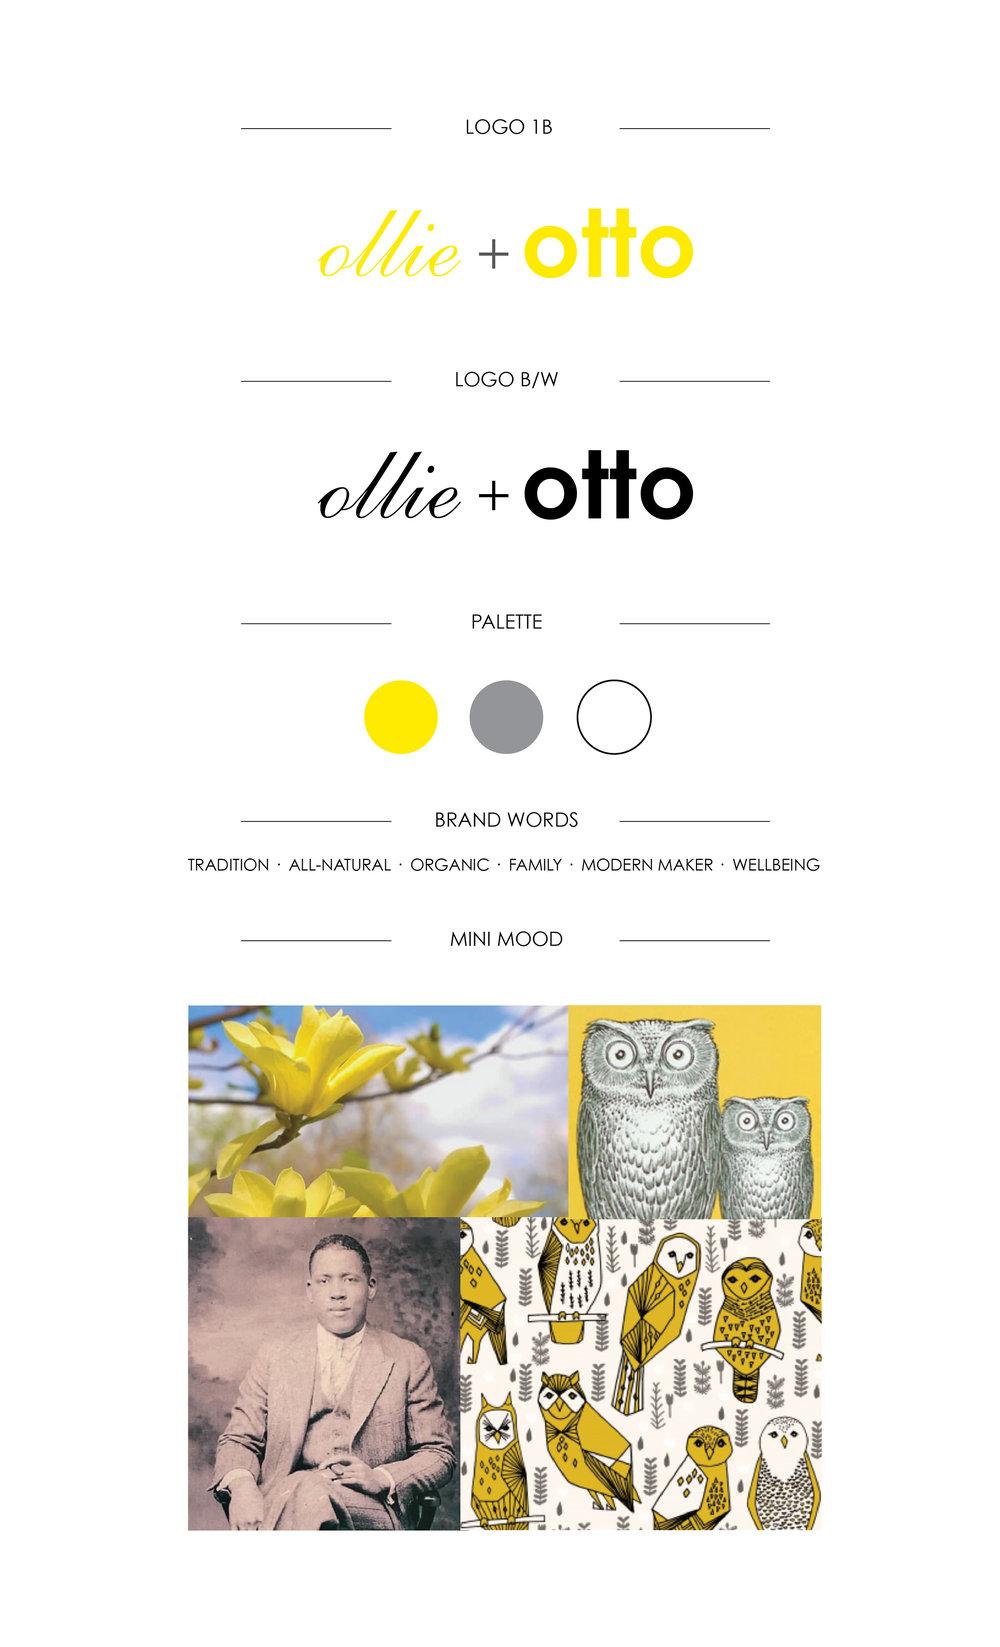 ollieandotto_logo-04.jpg